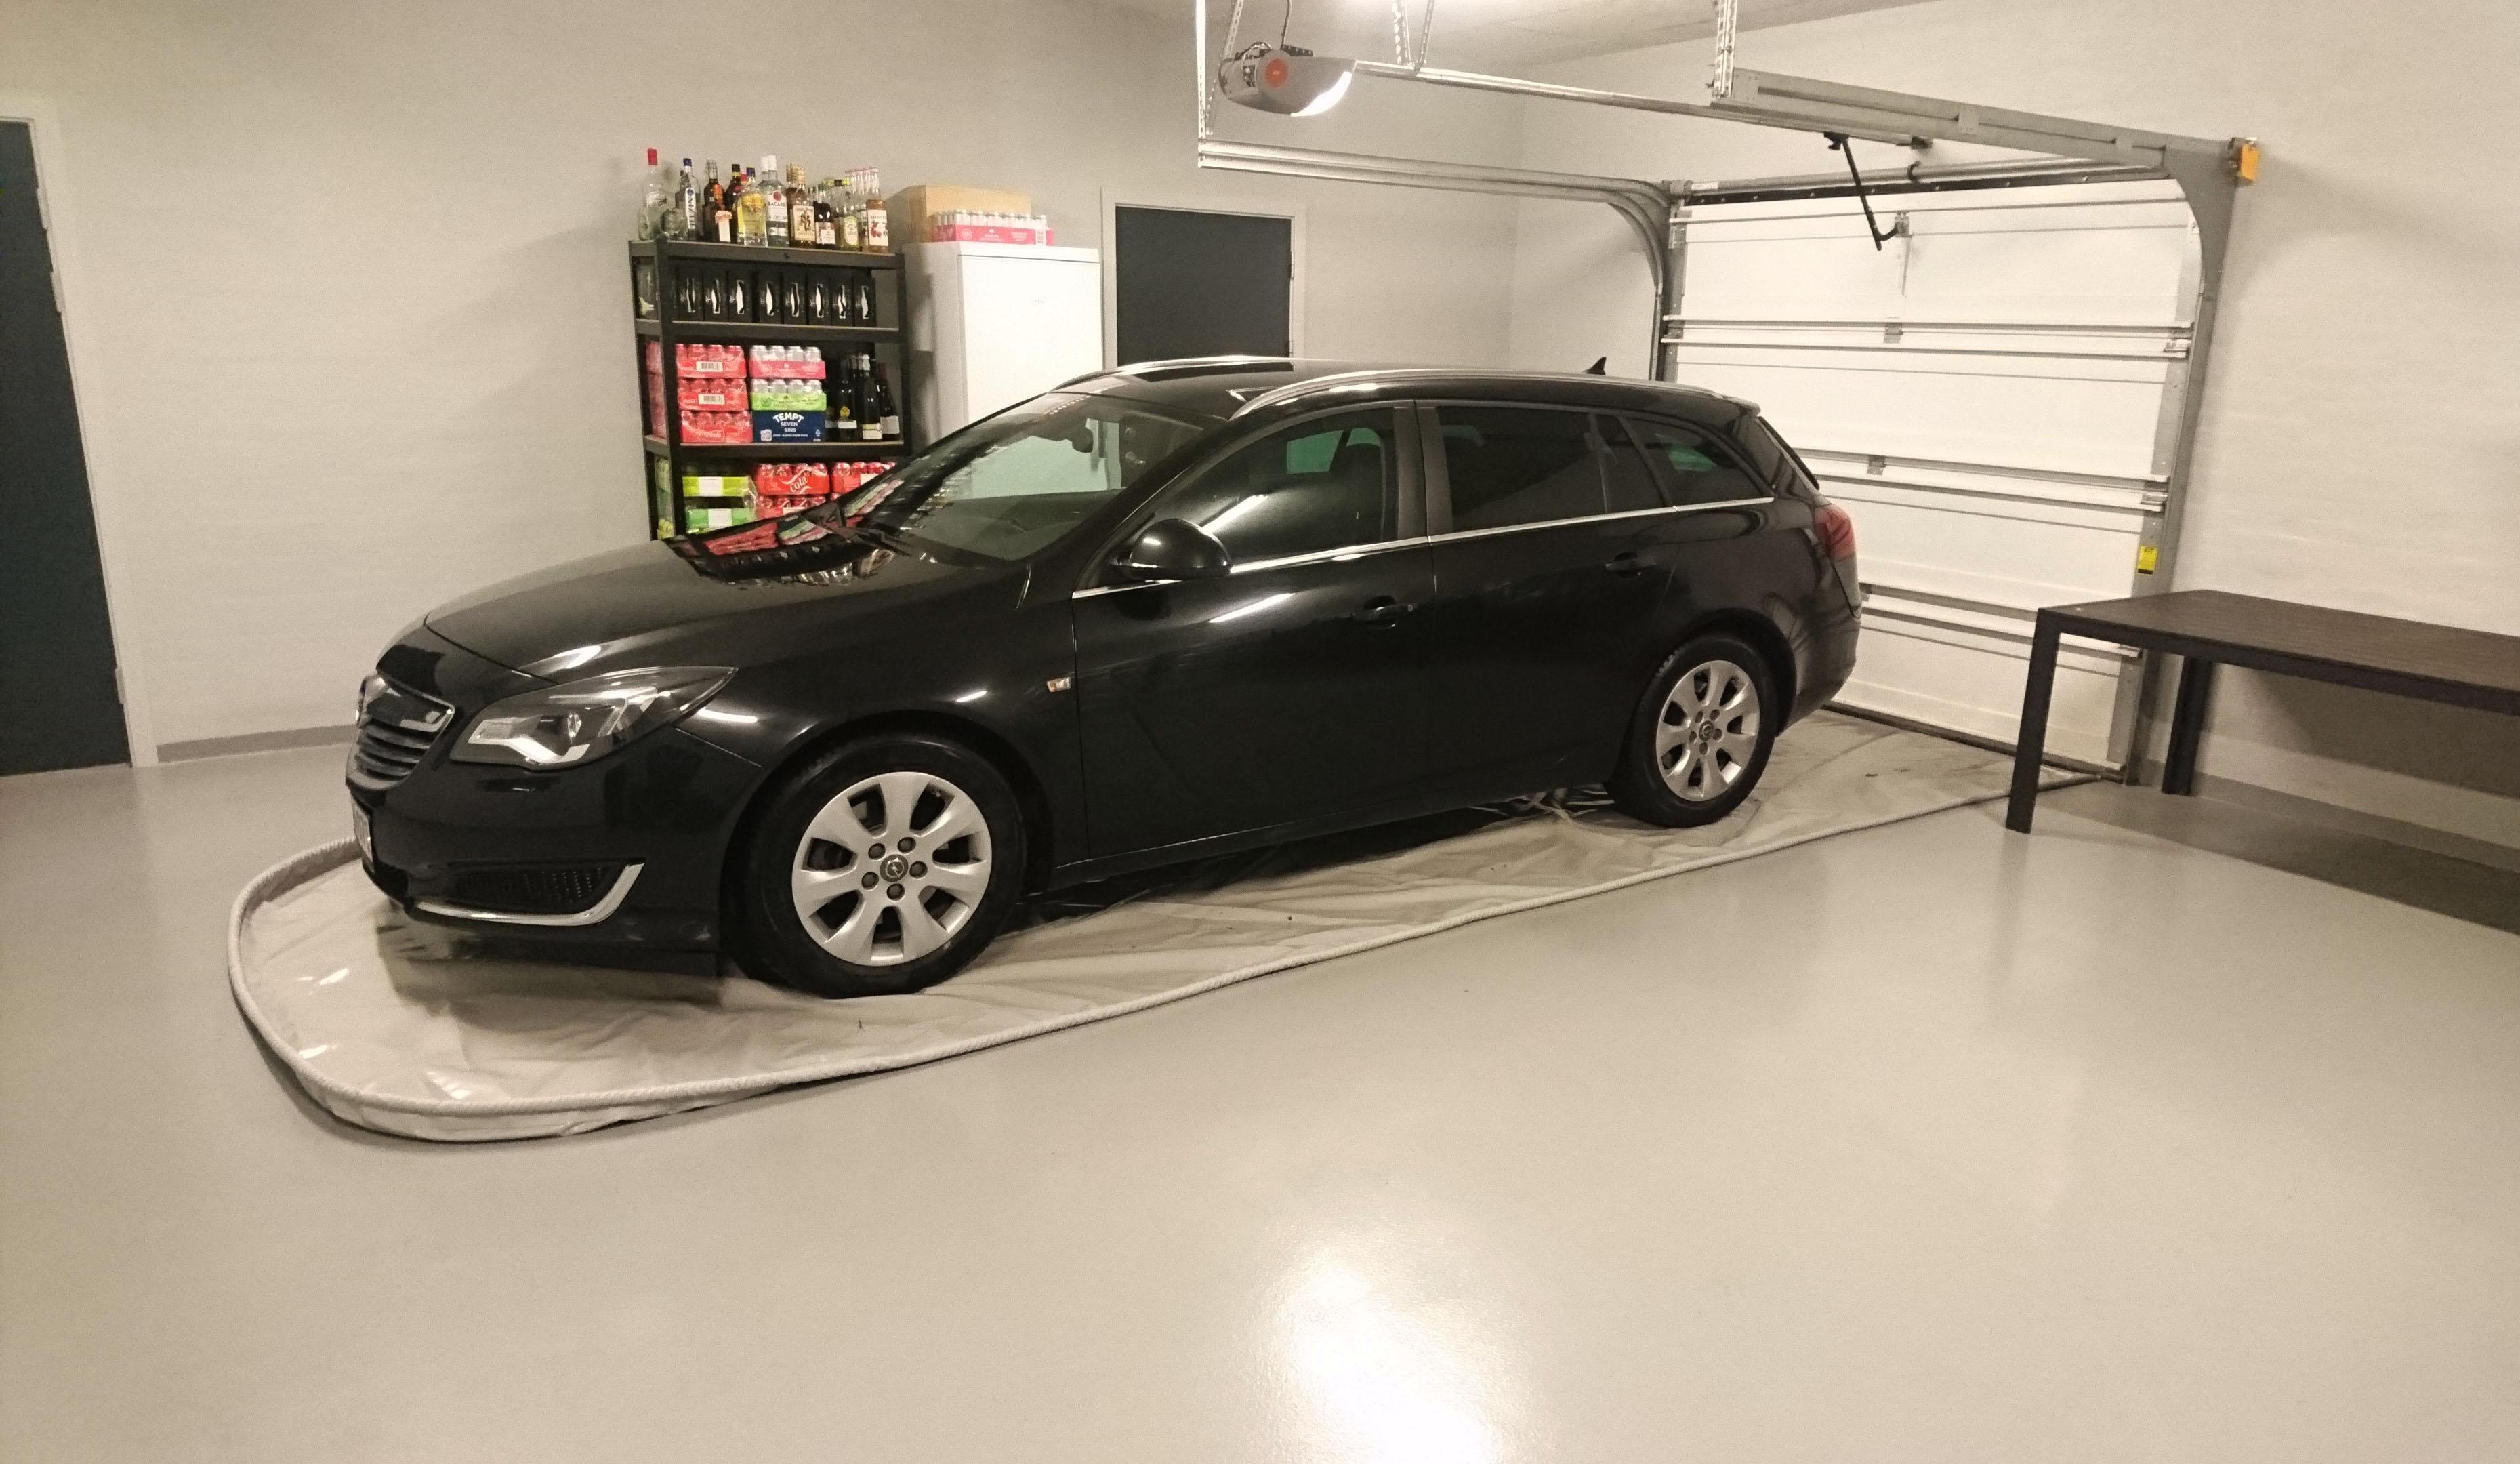 Spildunderlag til Opel stationcar